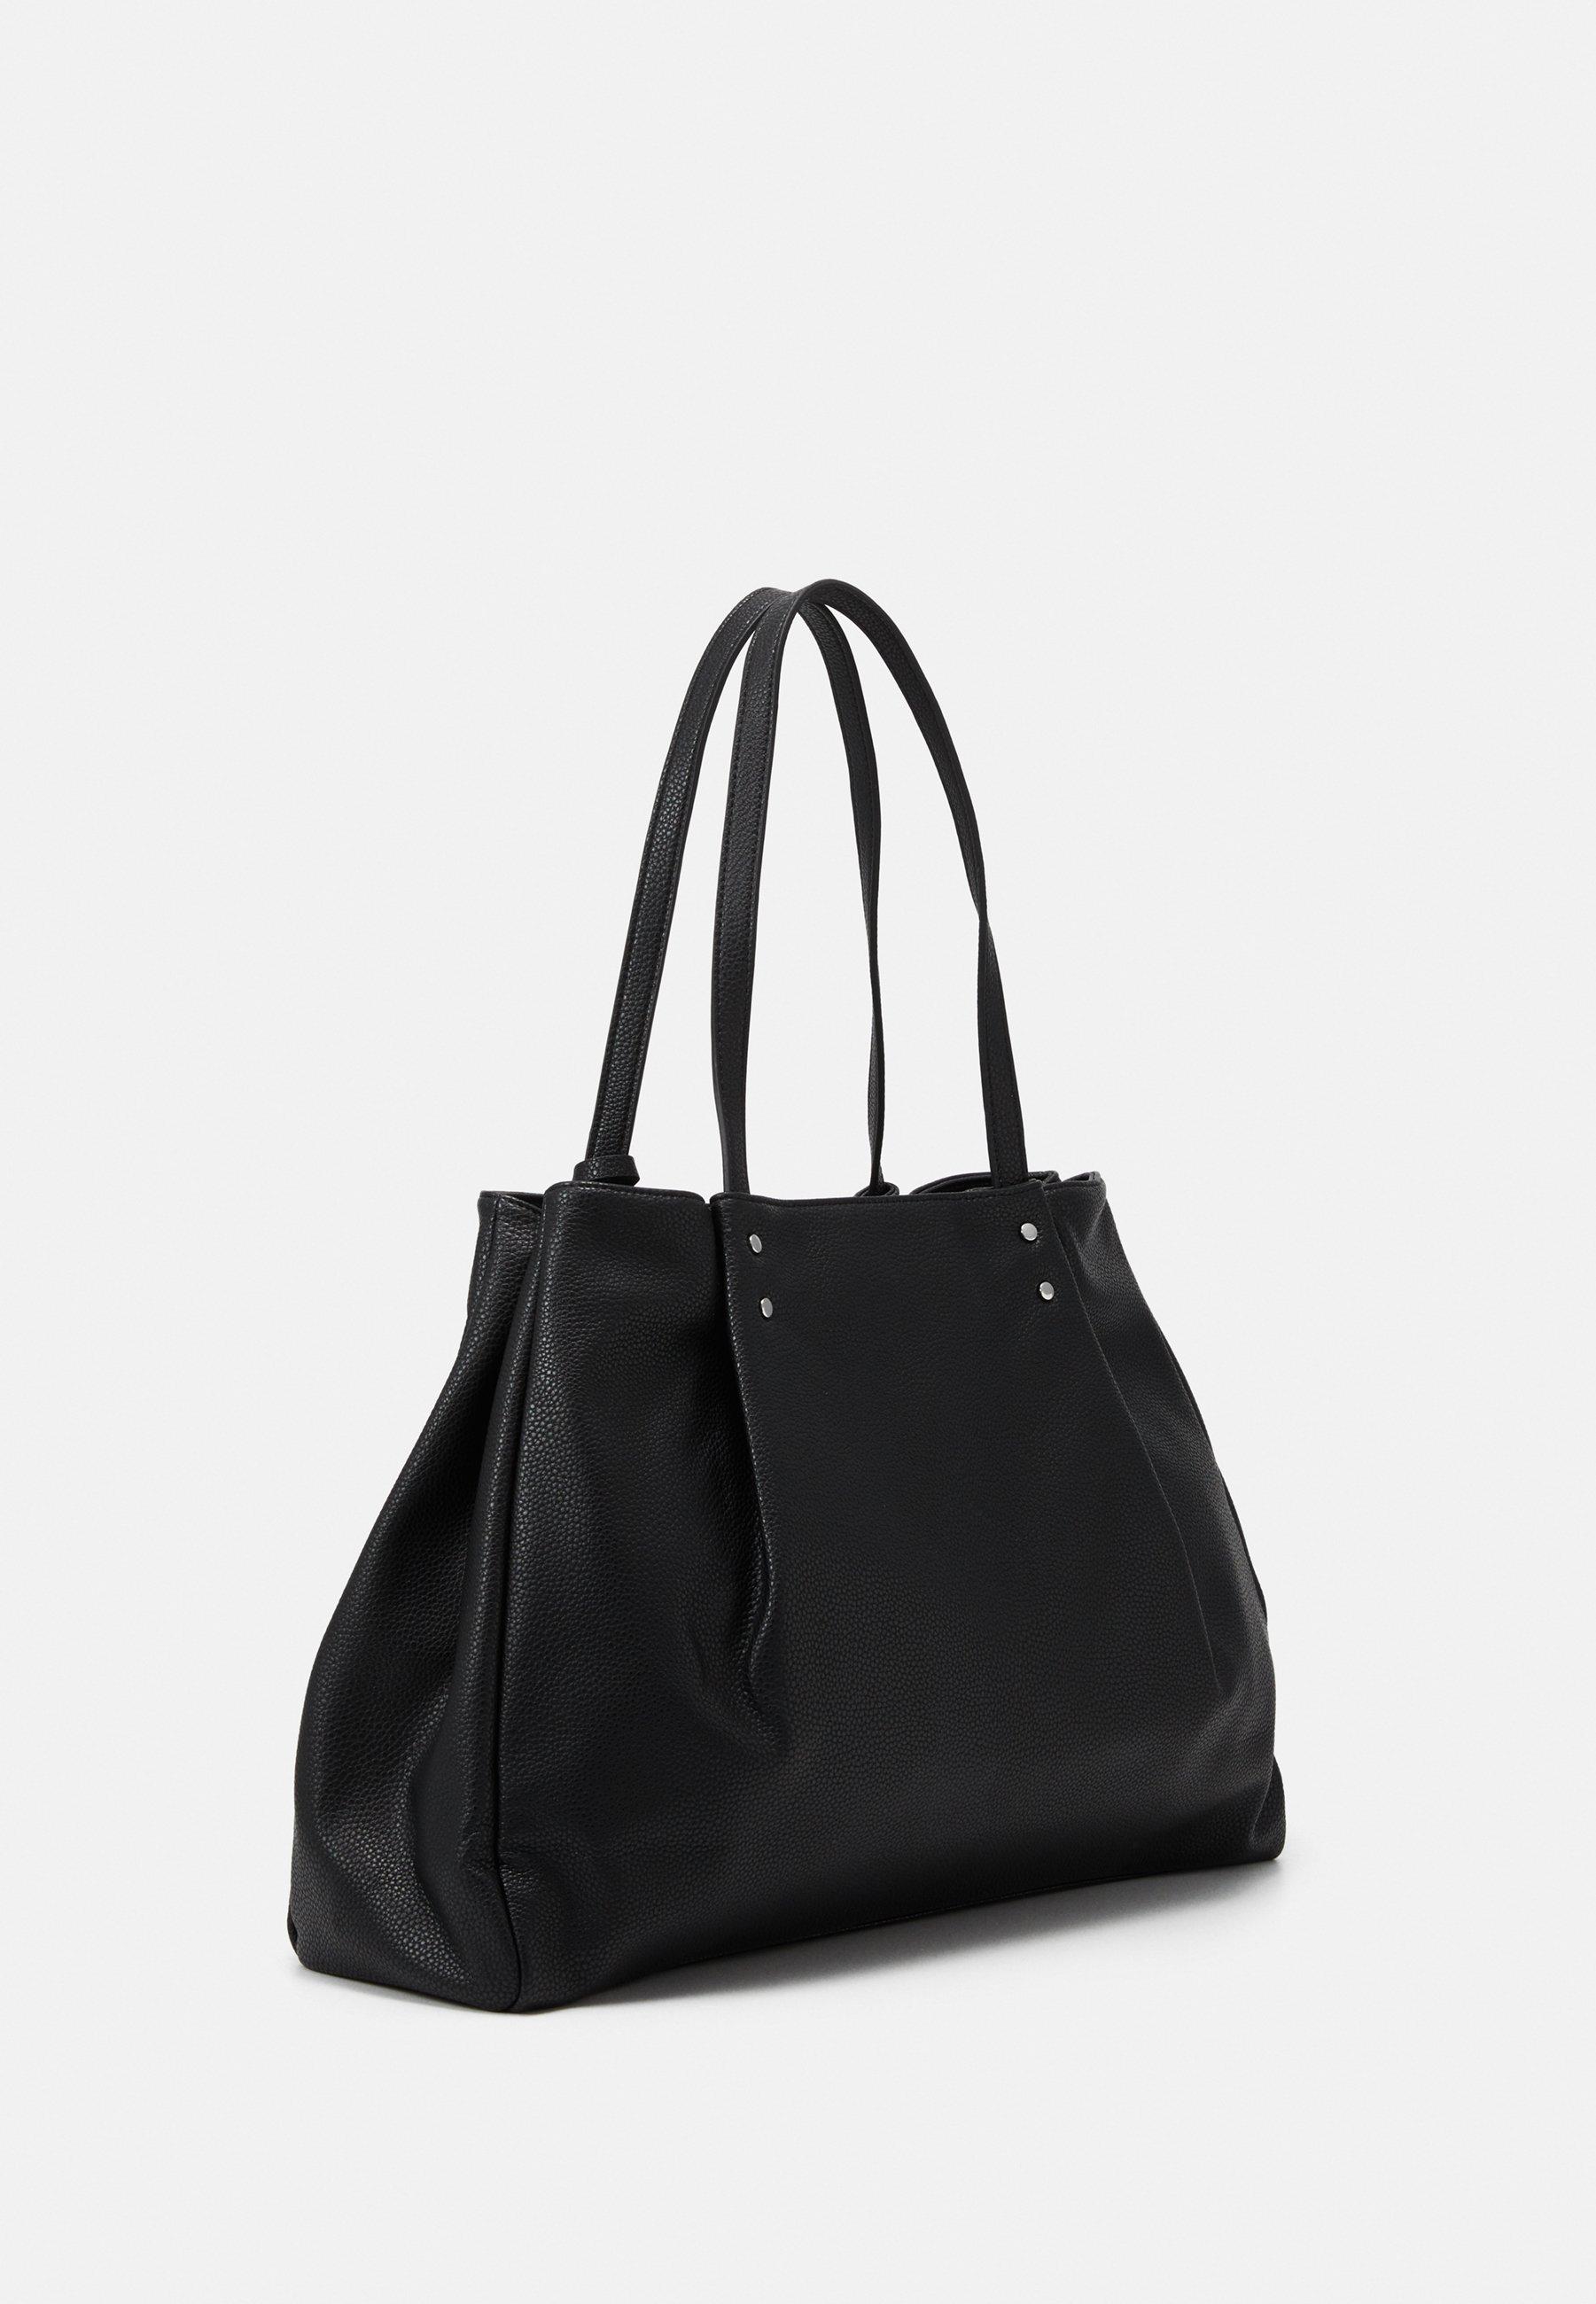 Benetton Shopping Bag - Black/schwarz